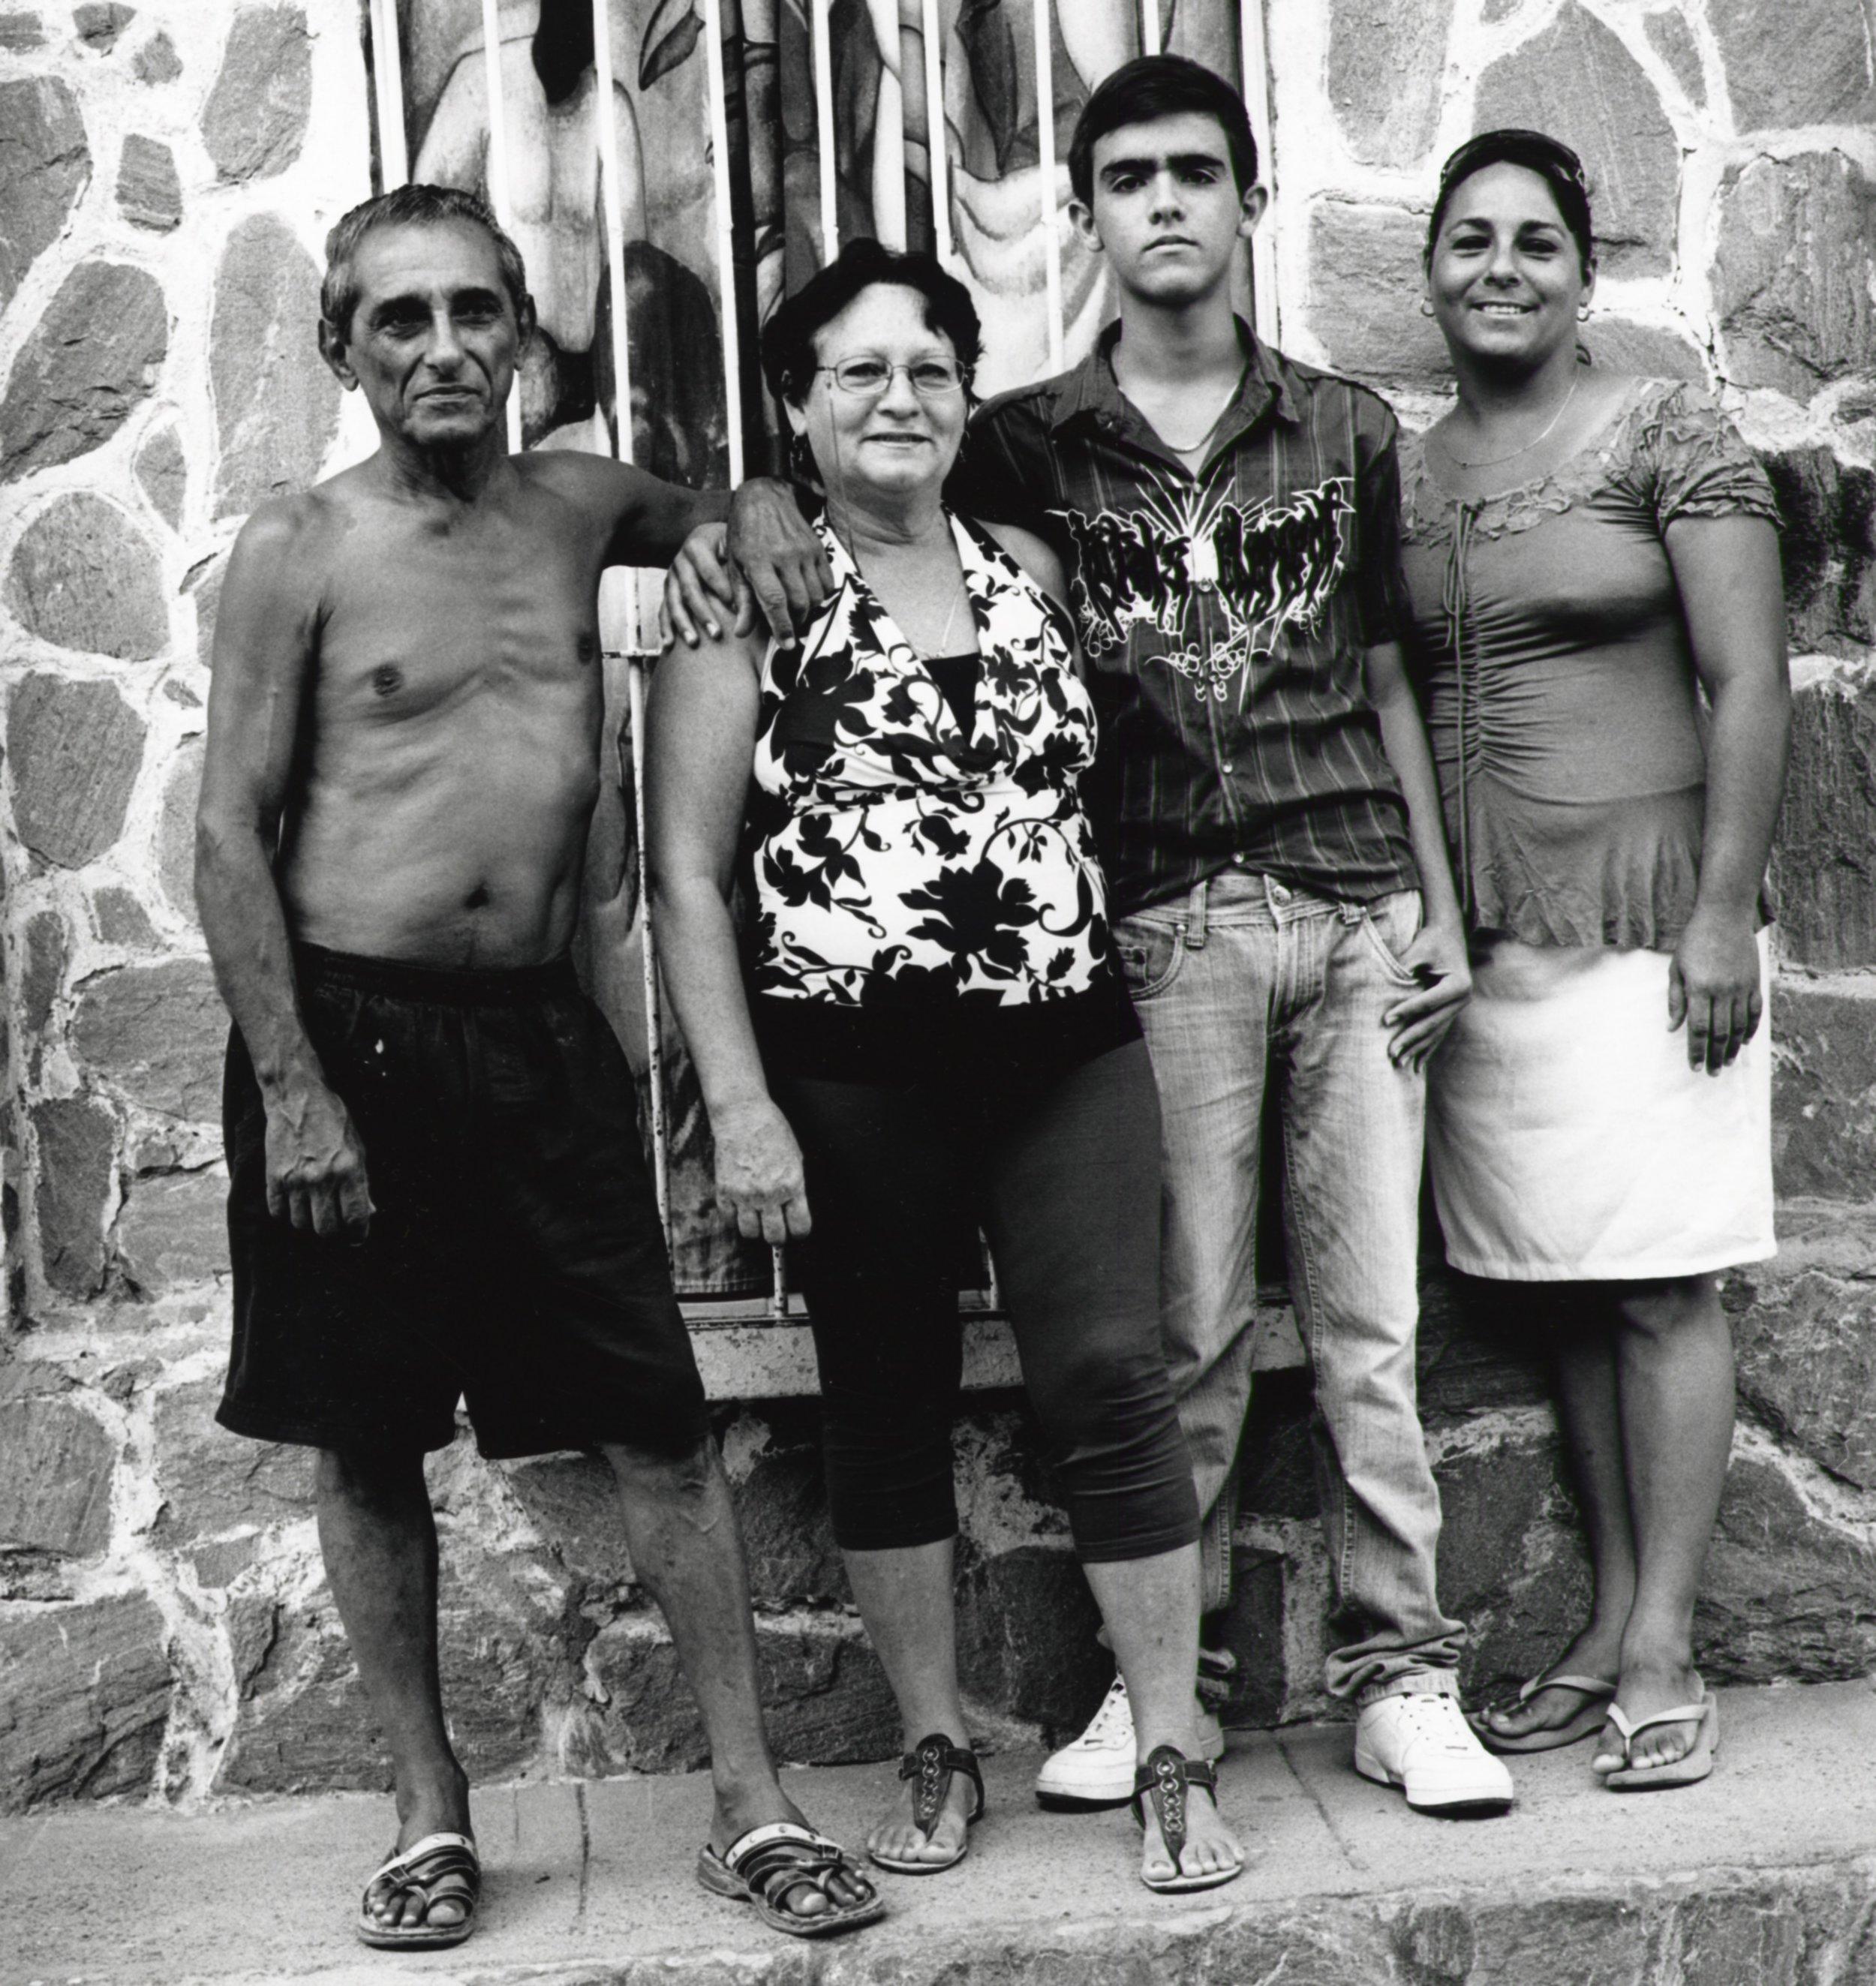 Gato Family - Trinidad Cuba 2015